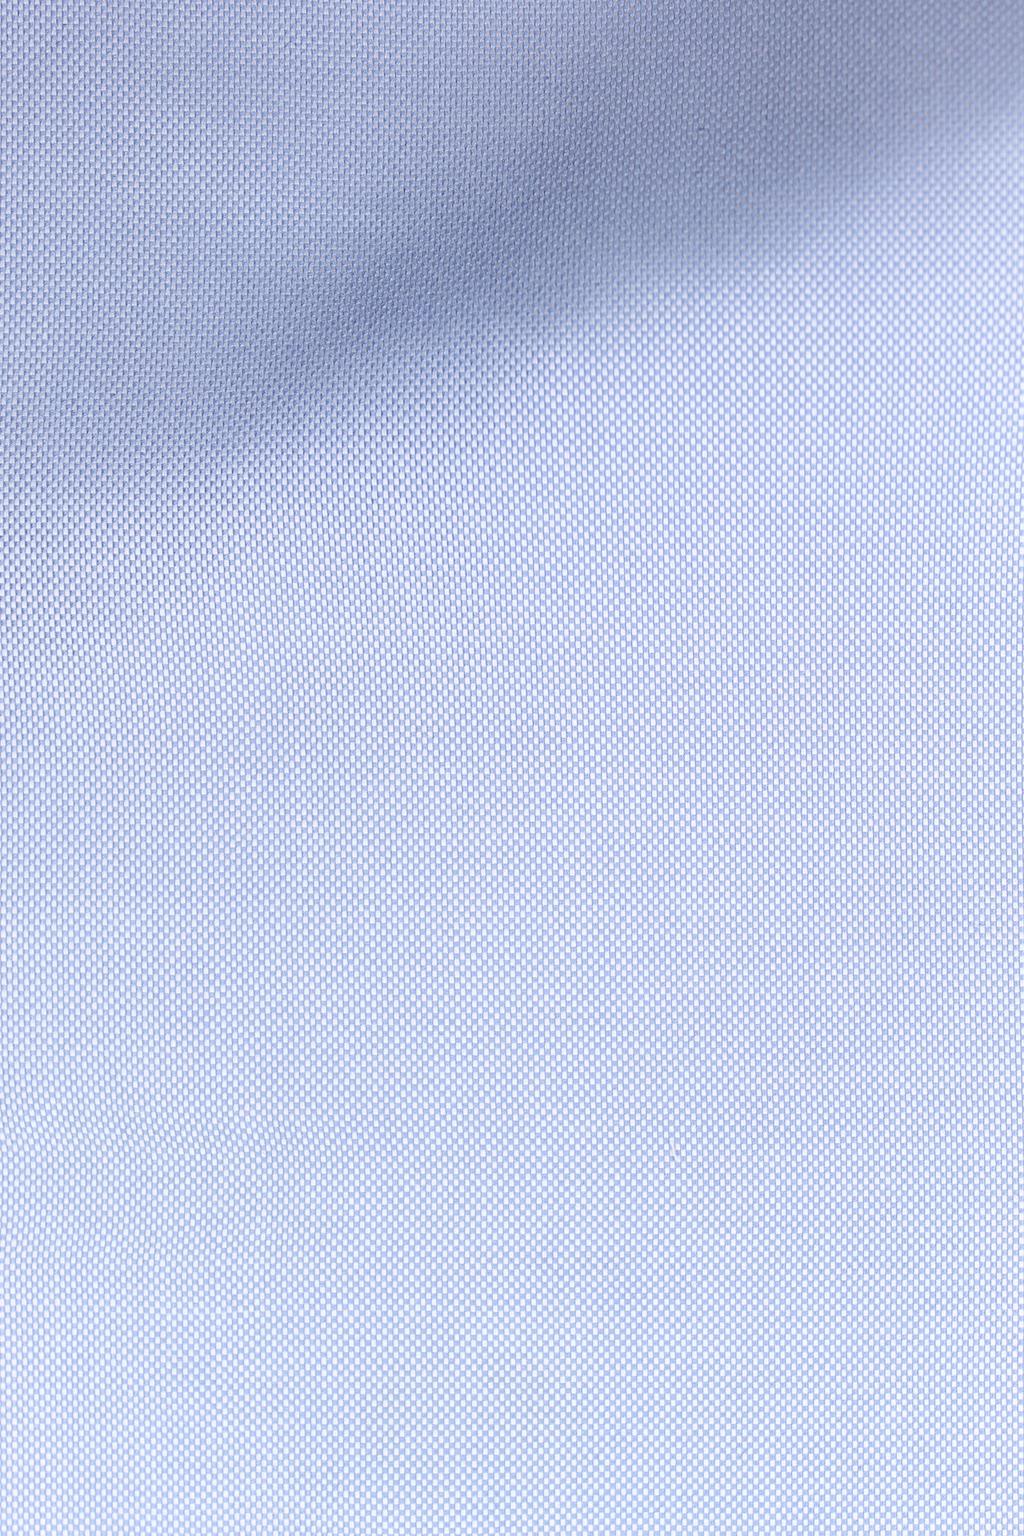 6706 Sky Blue Pinpoint.JPG